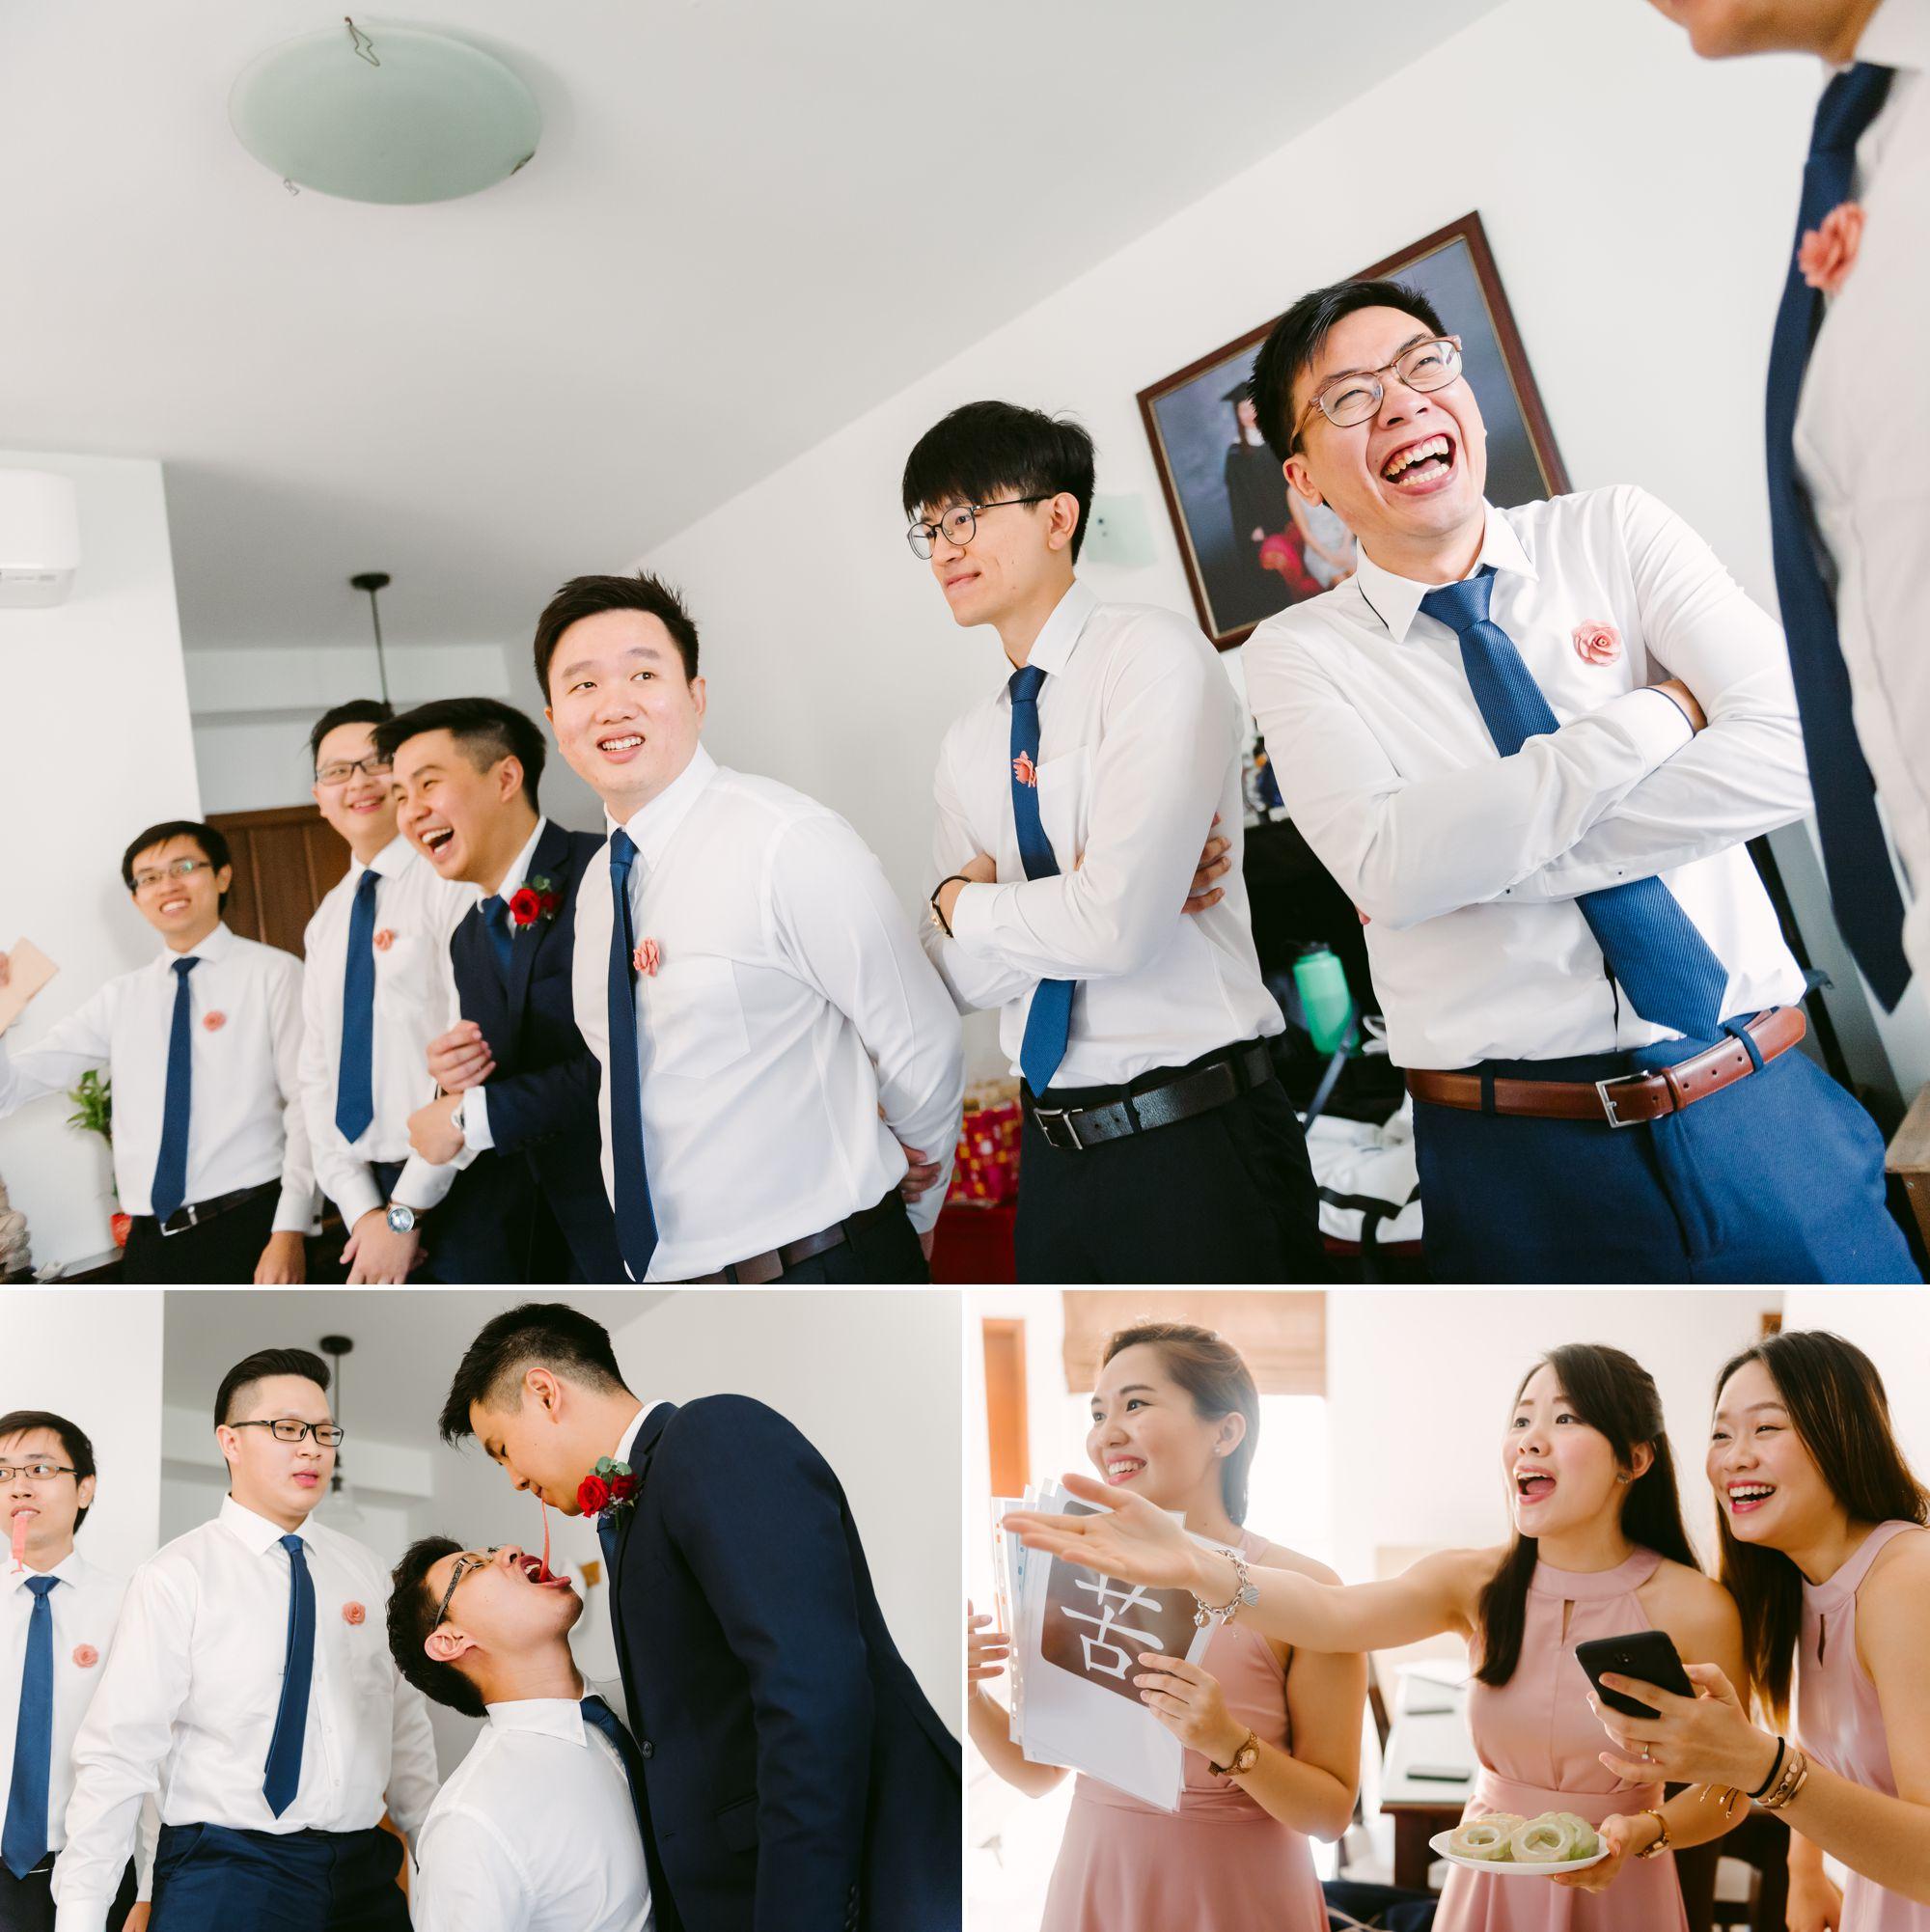 conrad_wedding_Singapore_ 11.jpg